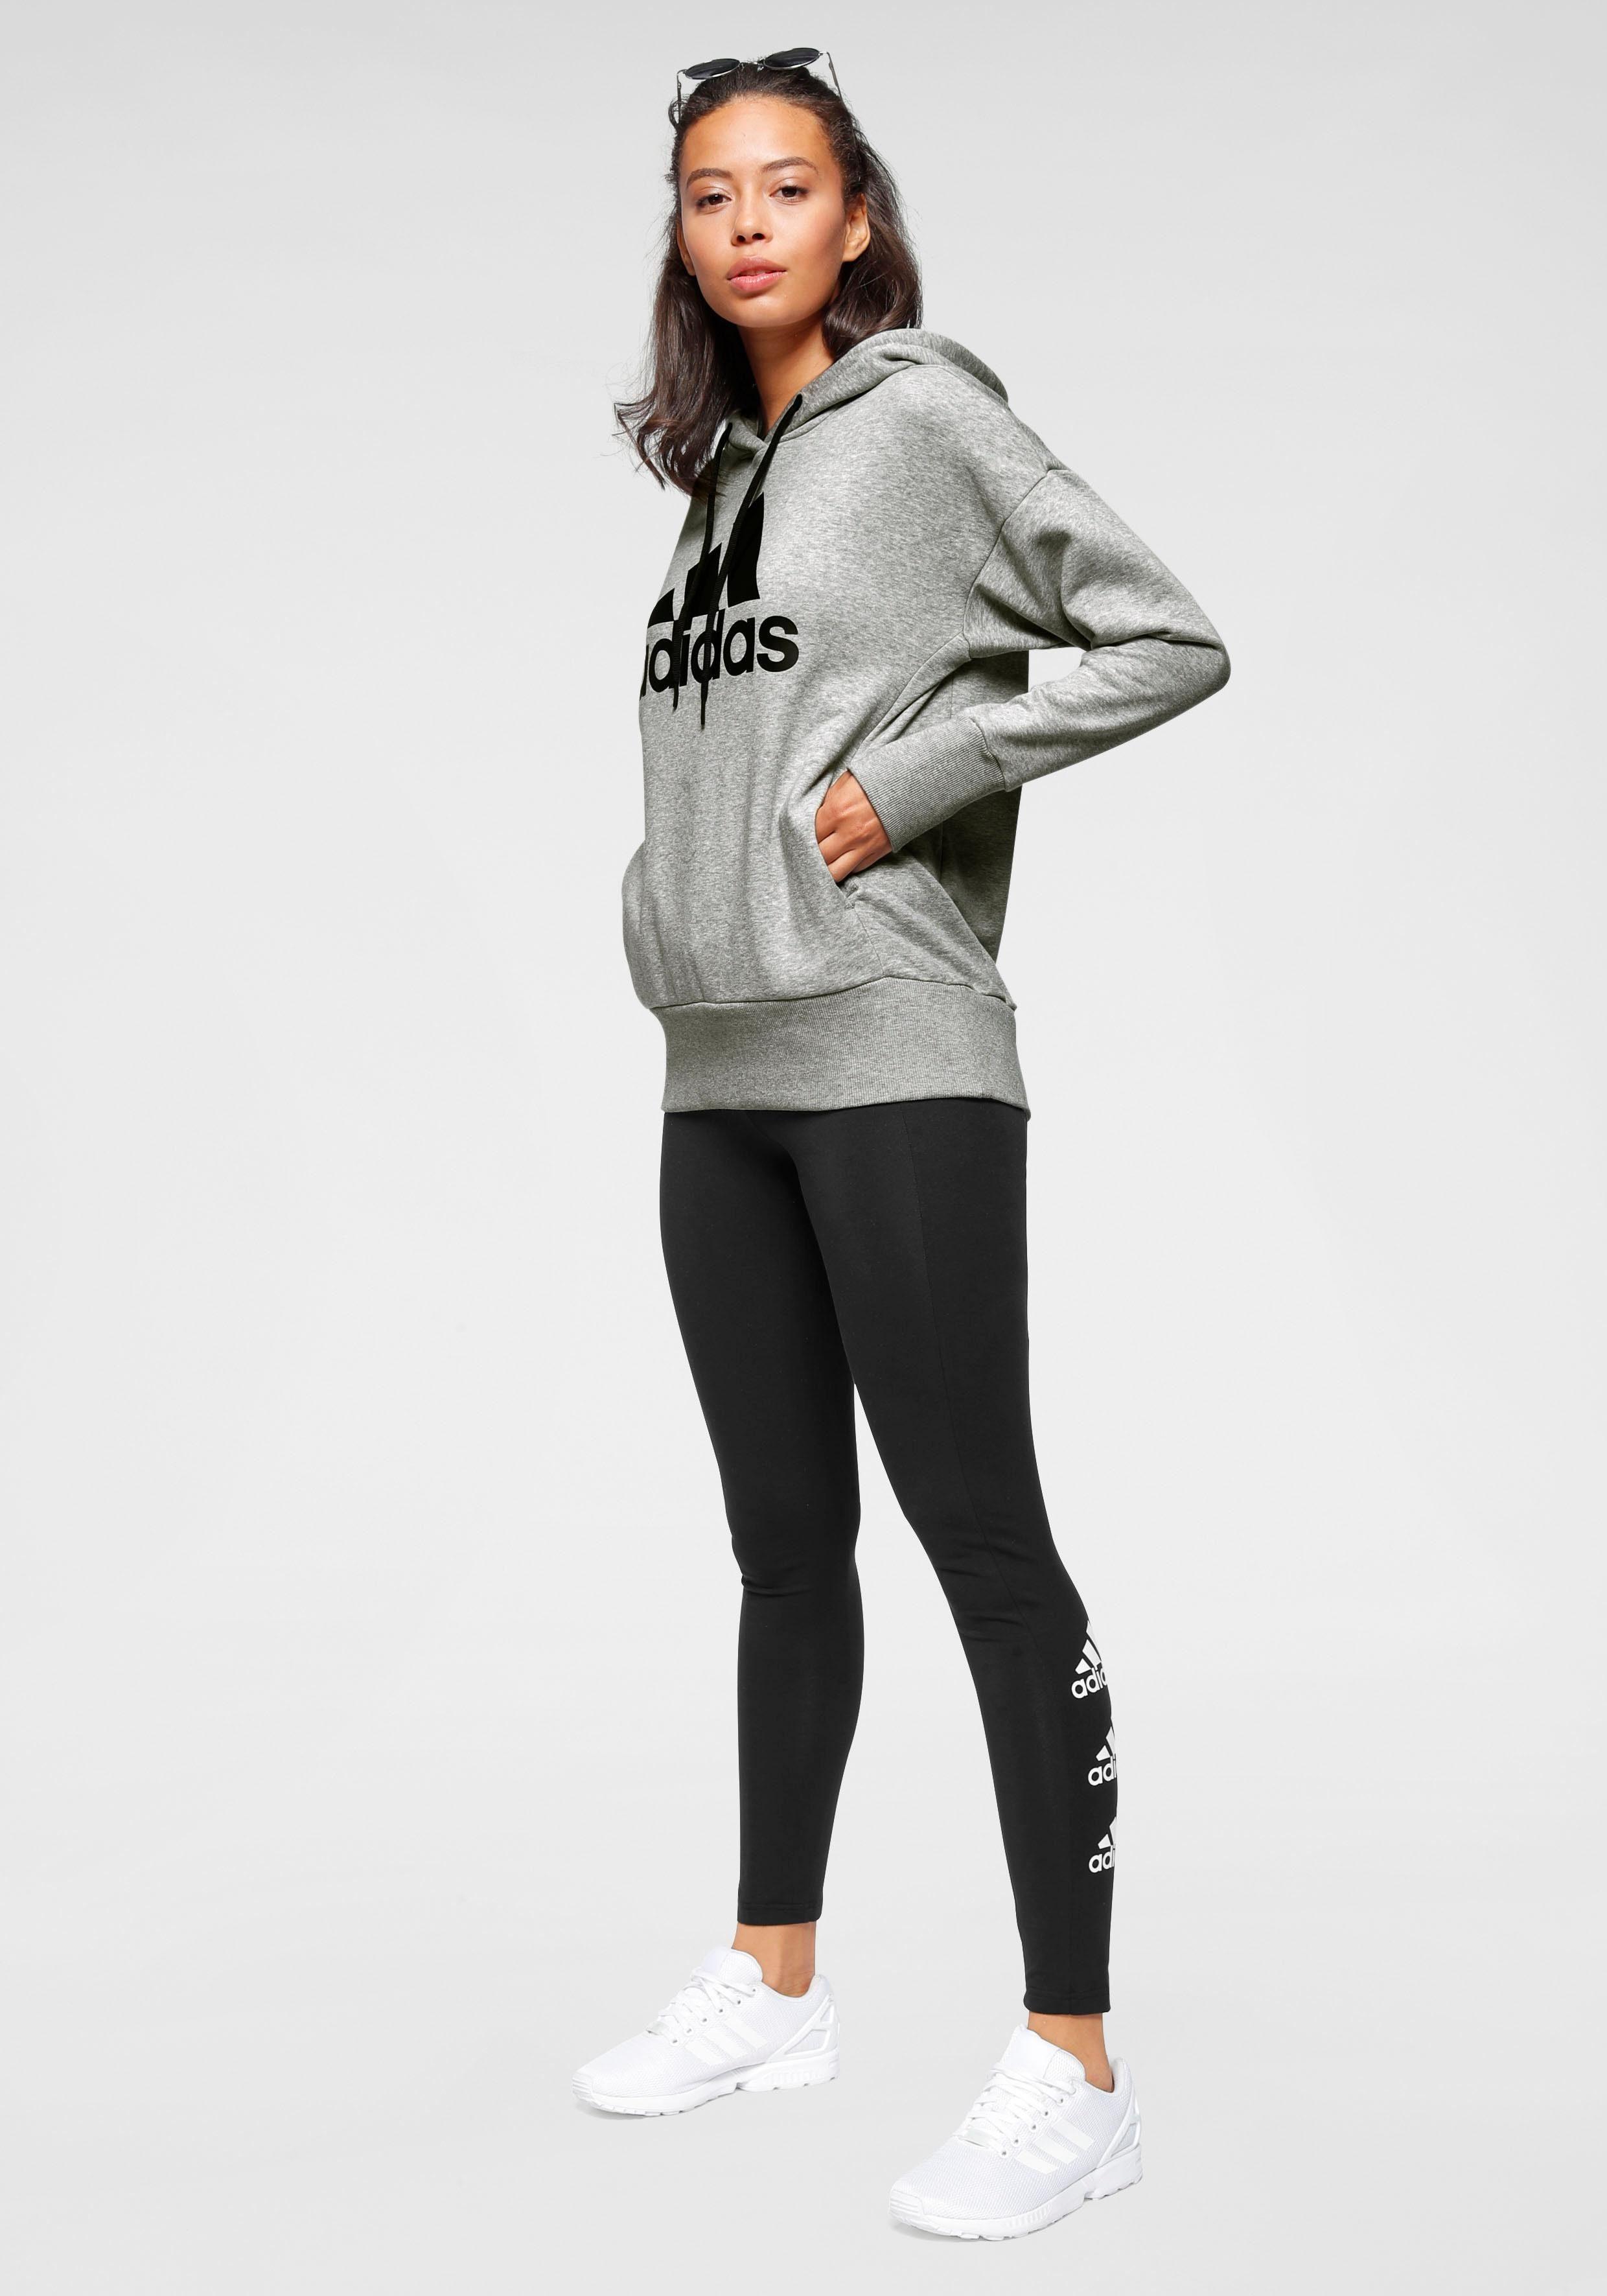 adidas Performance Kapuzensweatshirt »BATCH OF SPORT LONG HOODY« online kaufen | OTTO